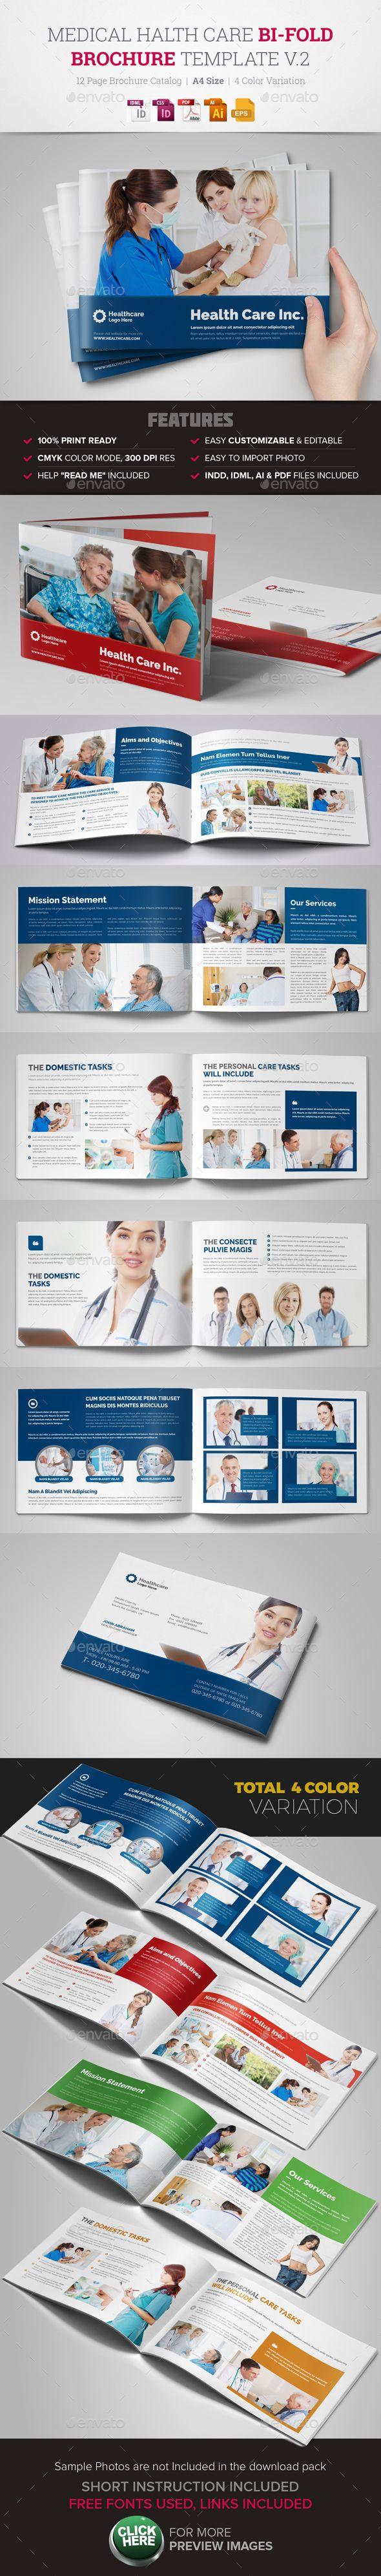 Medical HealthCare Brochure InDesign Template #design Download: http://graphicriver.net/item/medical-healthcare-brochure-indesign-template-v2/14141204?ref=ksioks